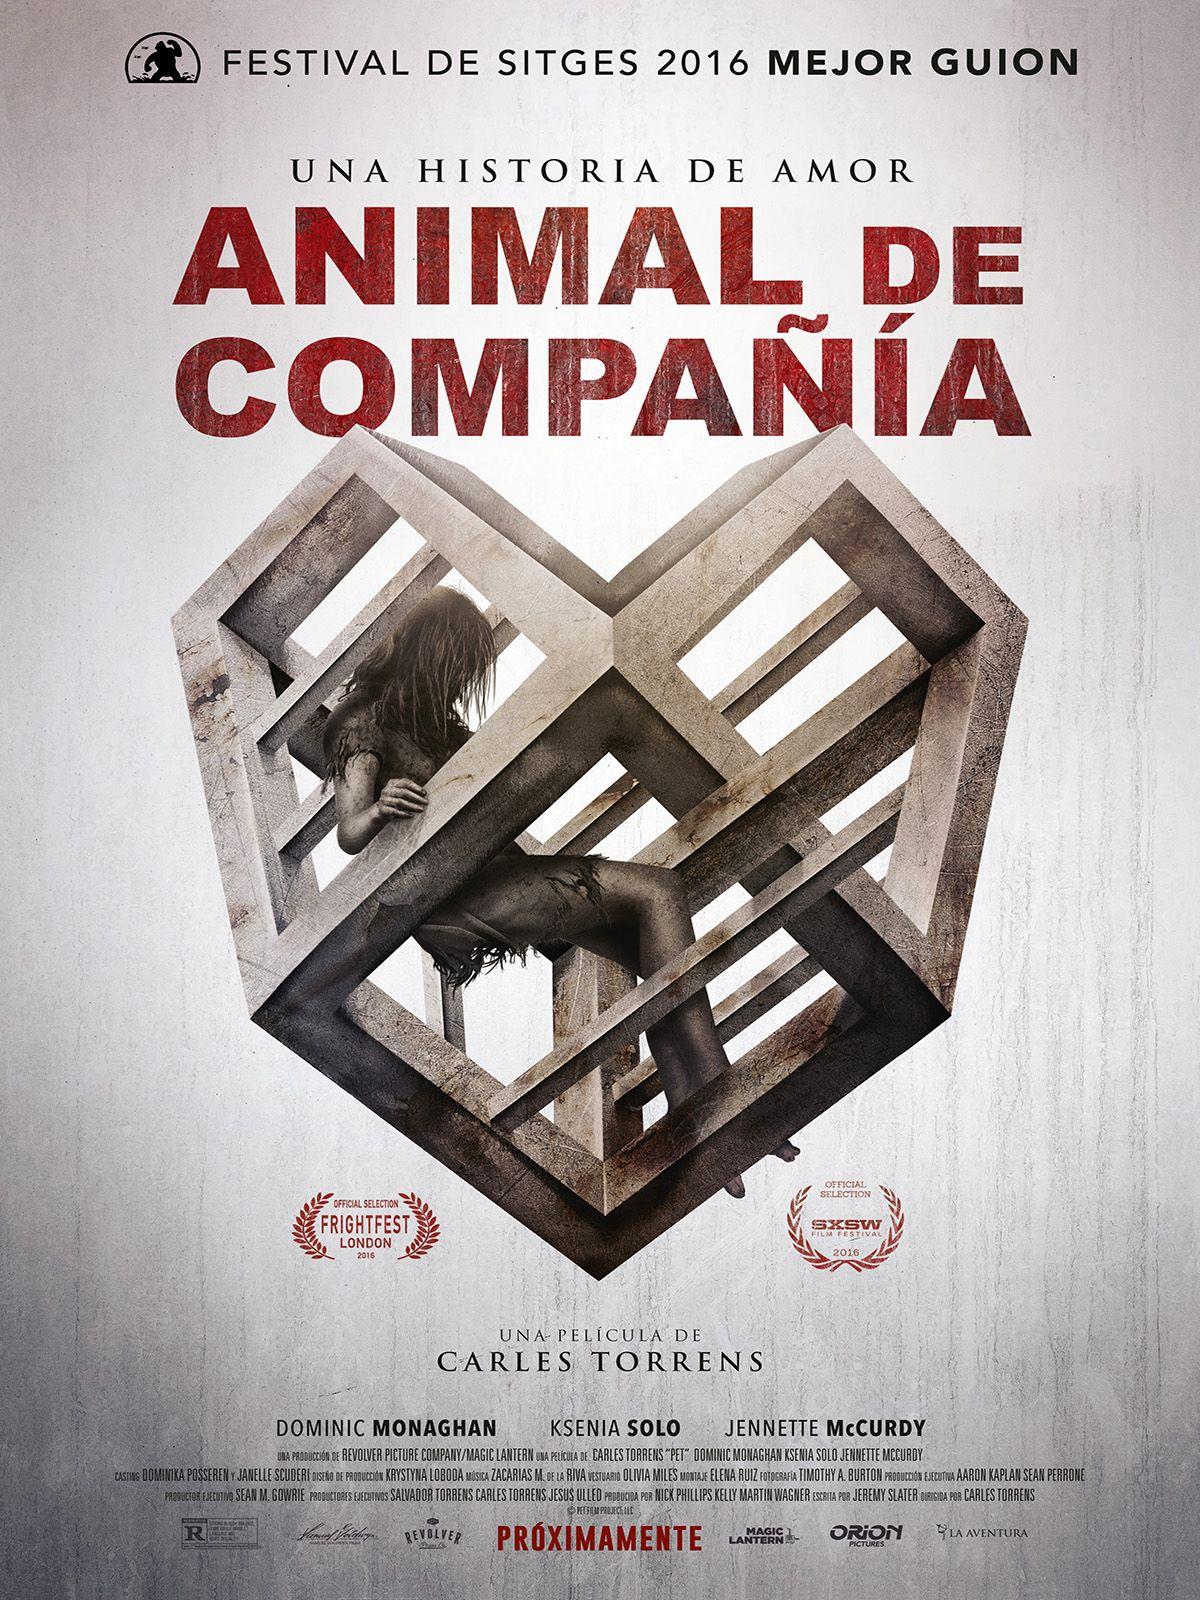 Animal De Compania Mega Latino 1080 Ver Peliculas Online Peliculas Completas Peliculas Completas En Castellano